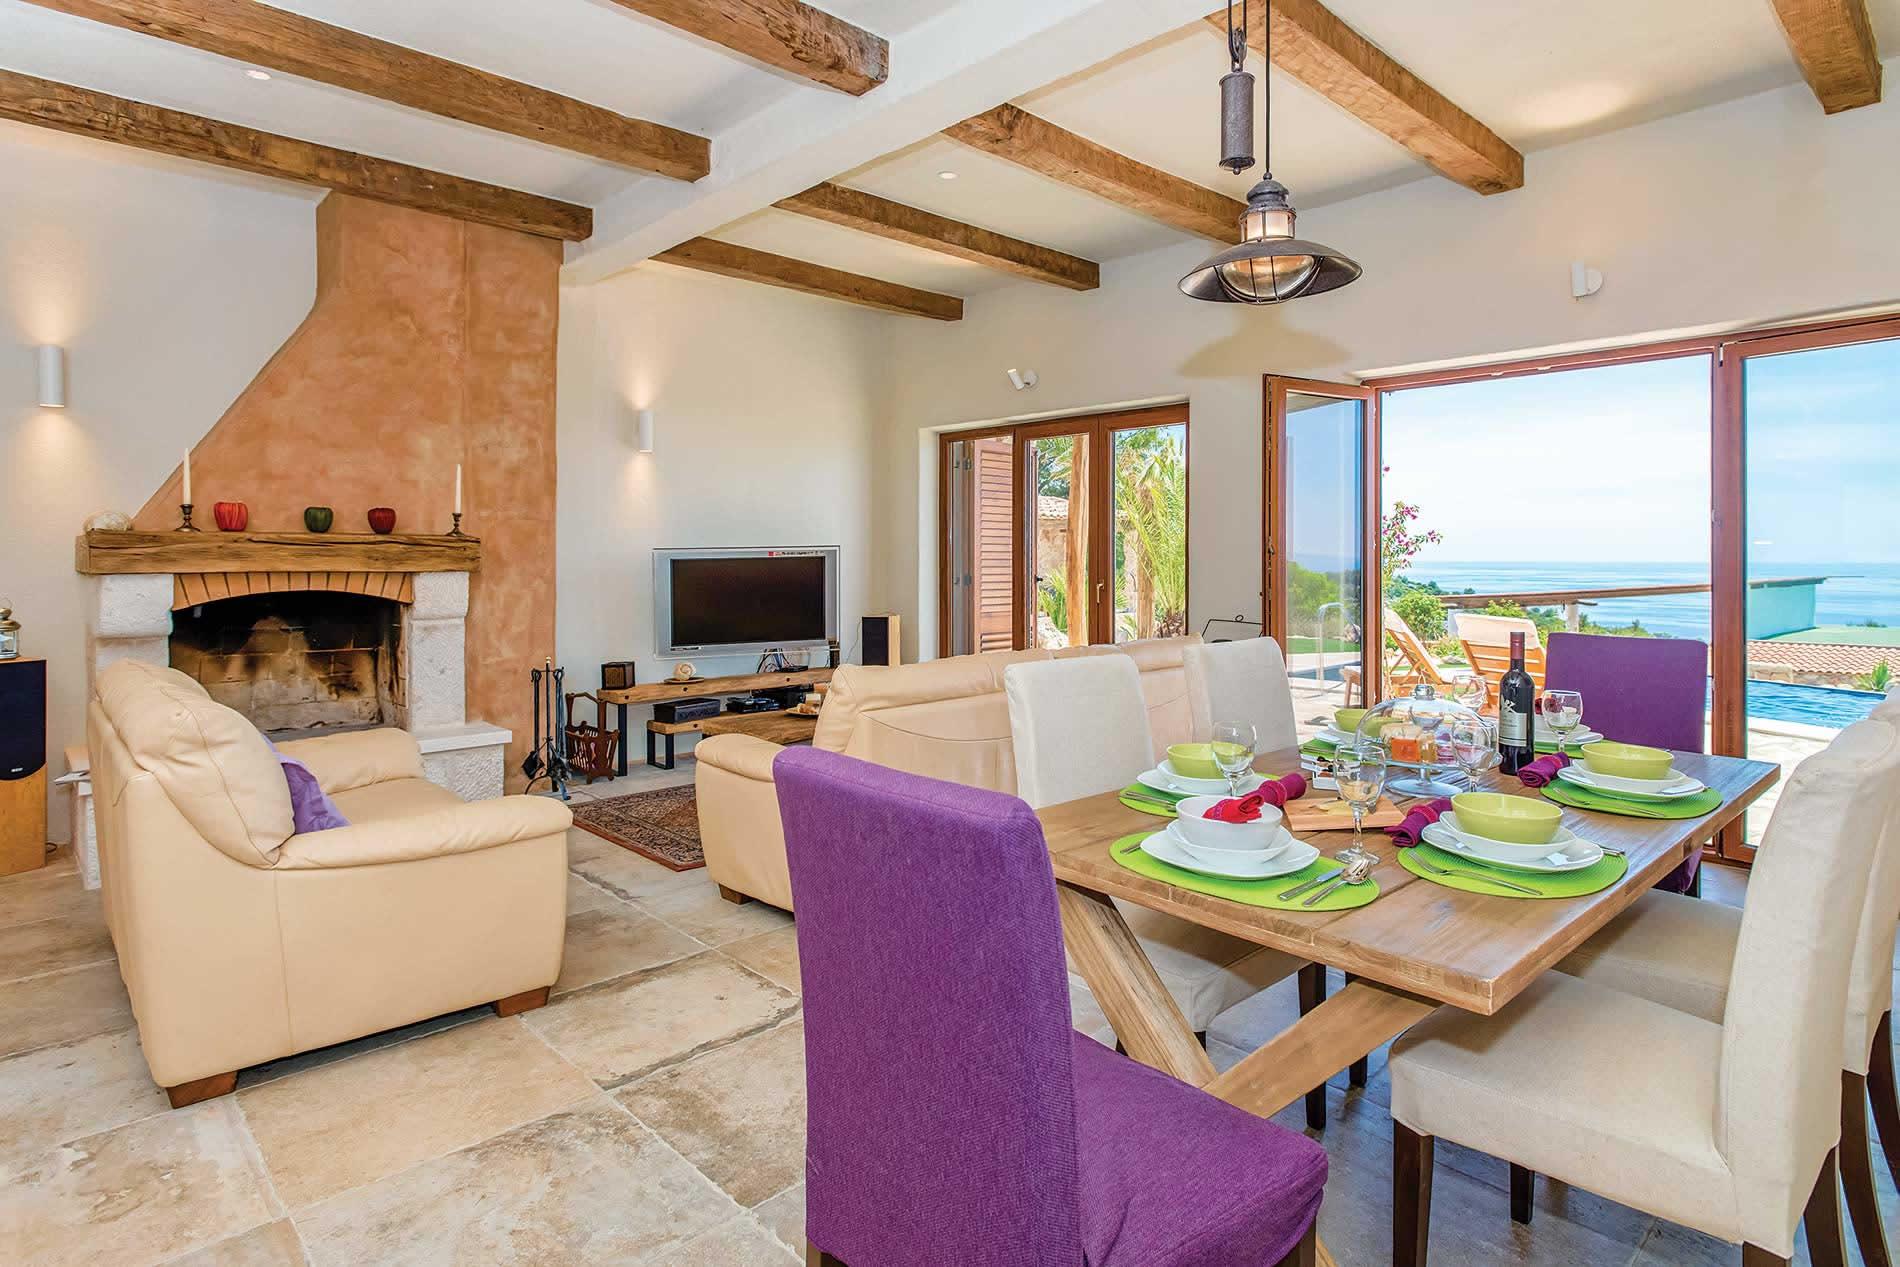 Villa Pelagos in Hvar - sleeps 8 people